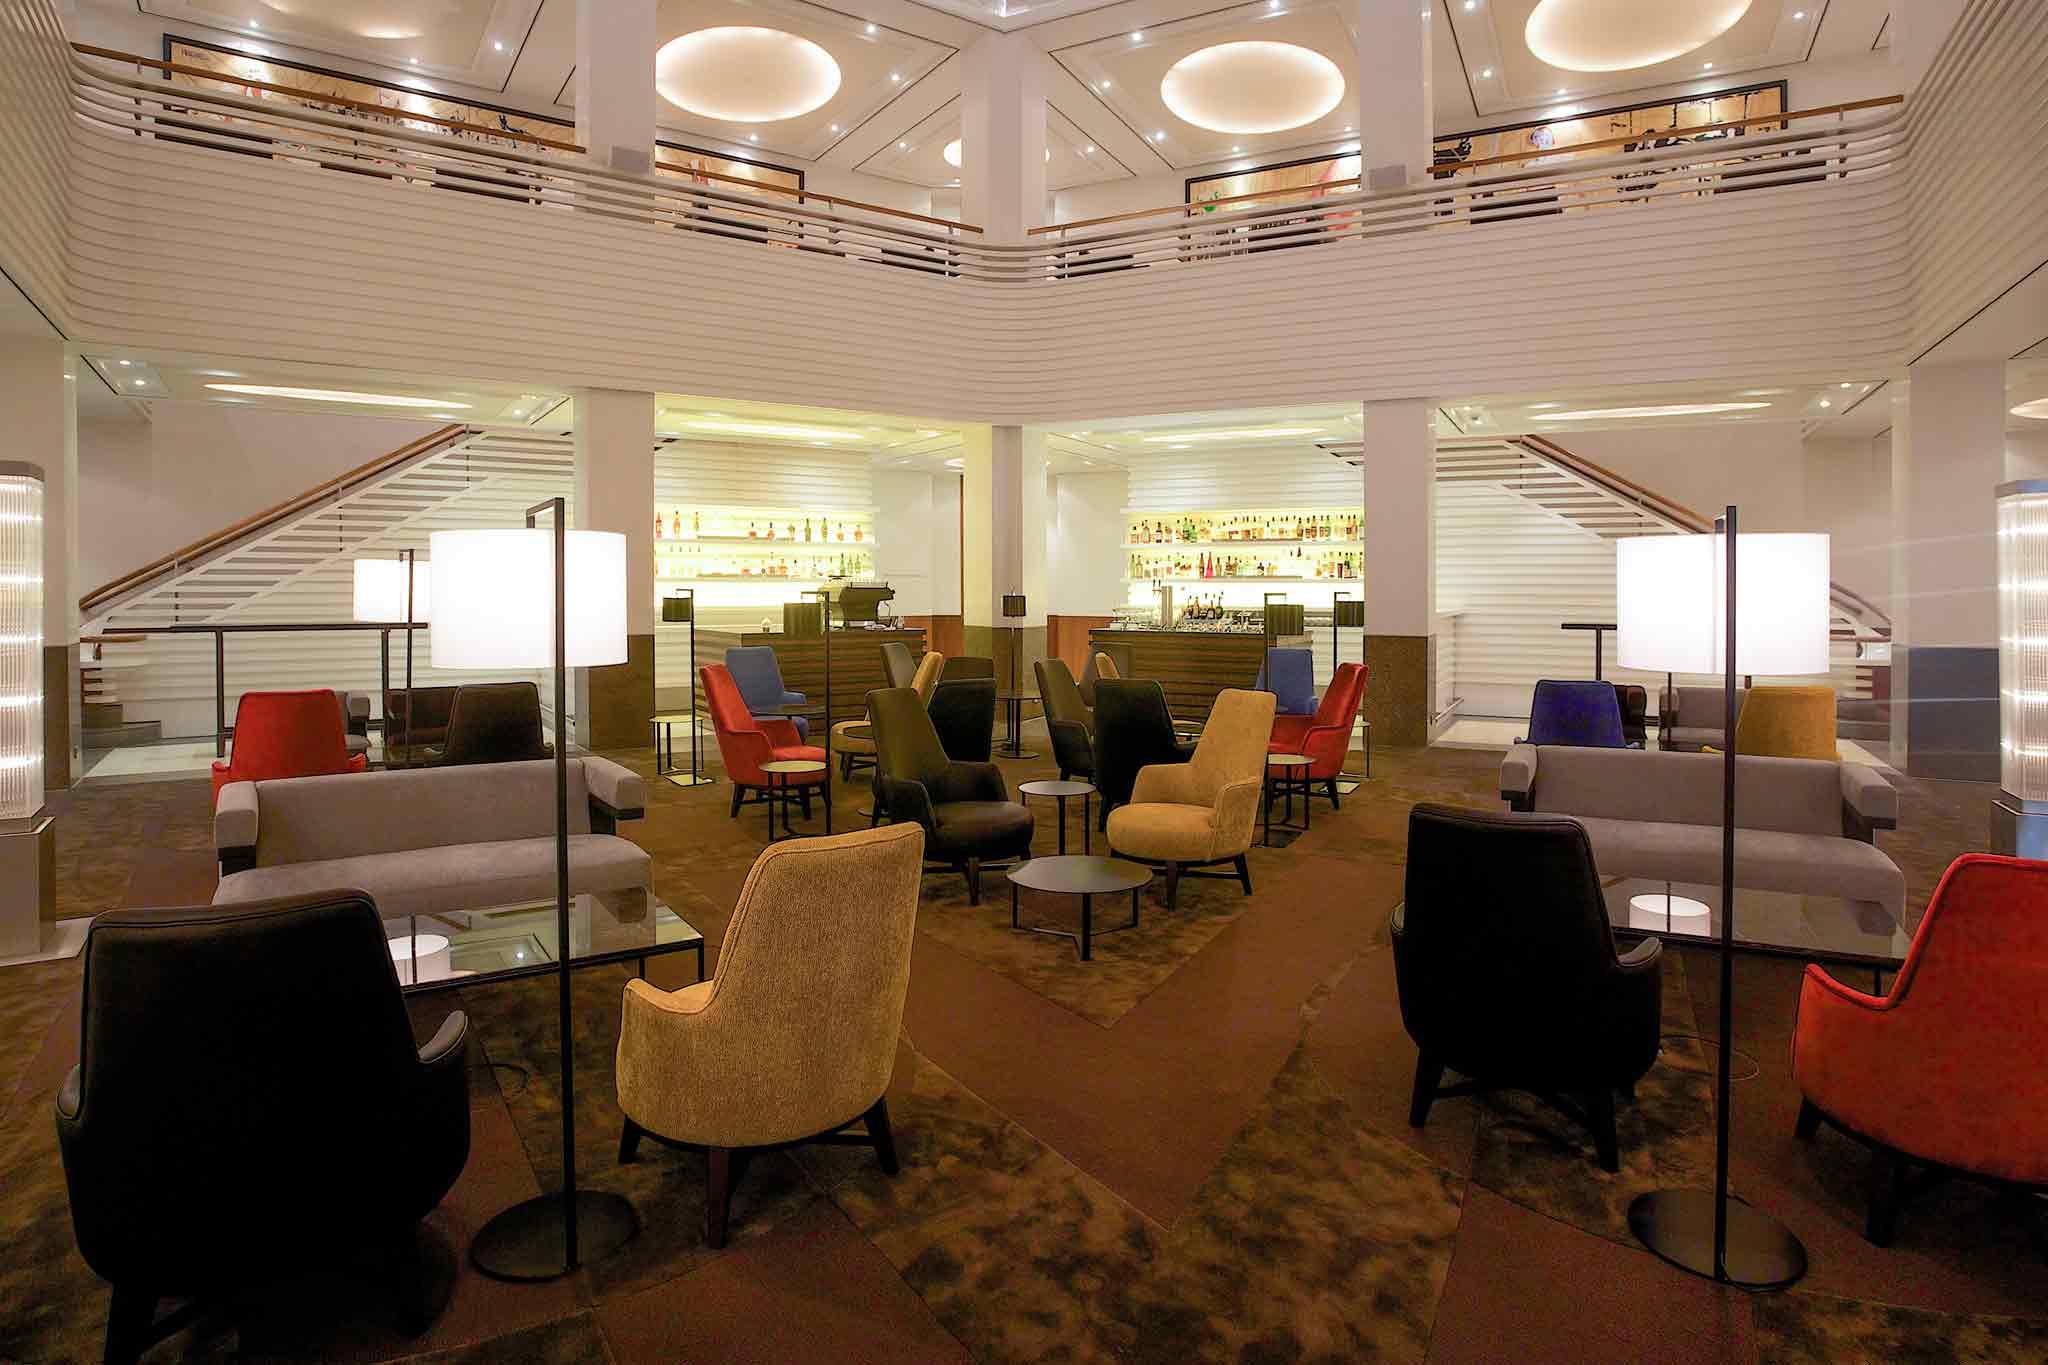 Hotel Sofitel Berlin Kurfurstendamm